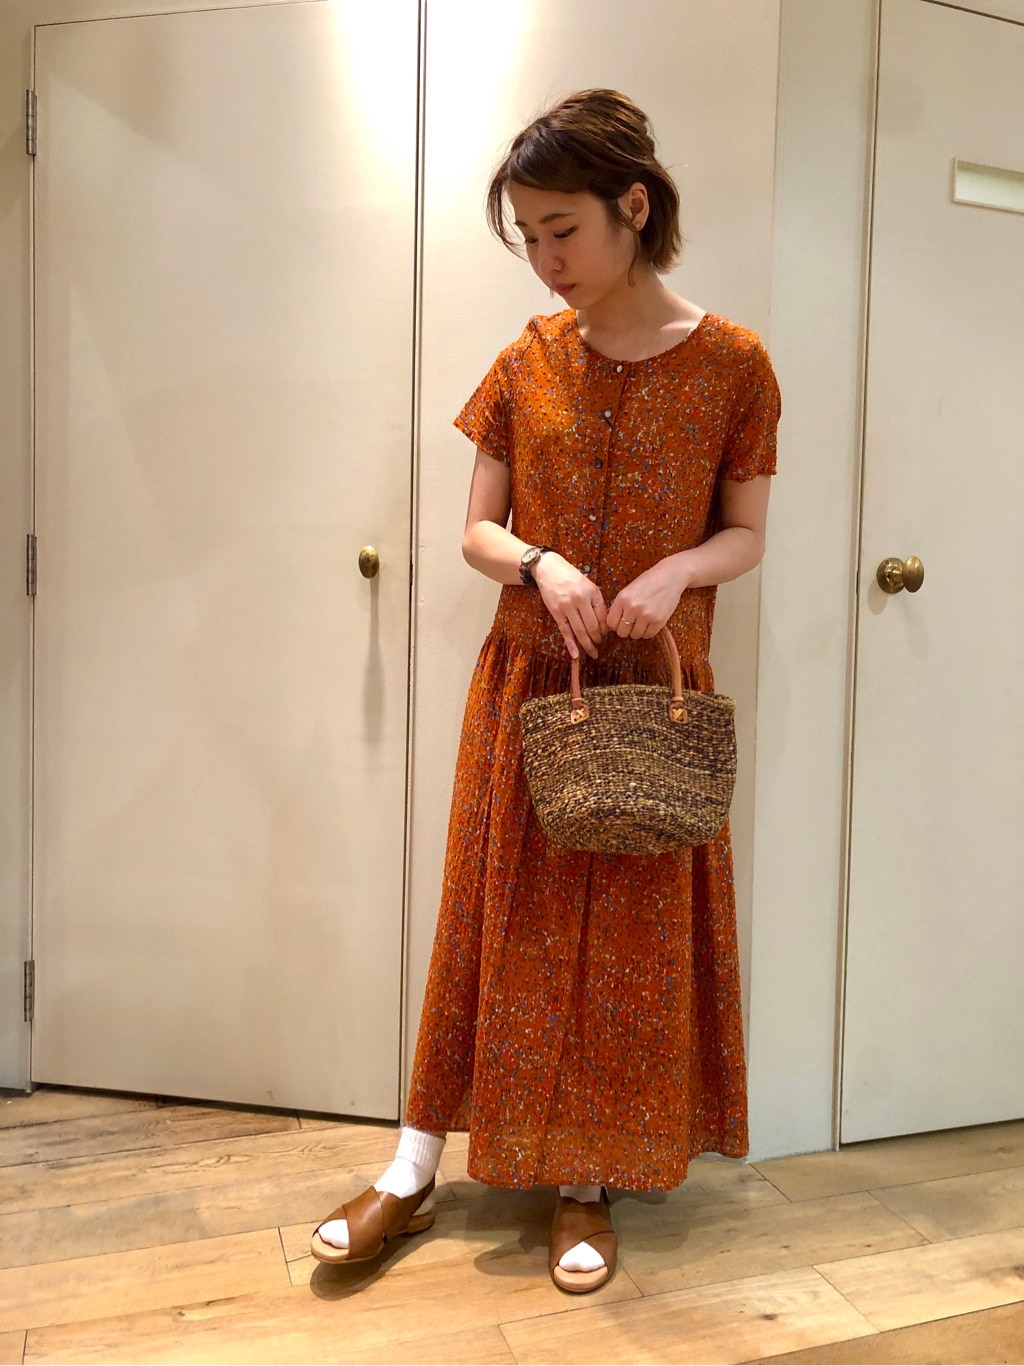 bulle de savon 新宿ミロード 身長:157cm 2020.06.11